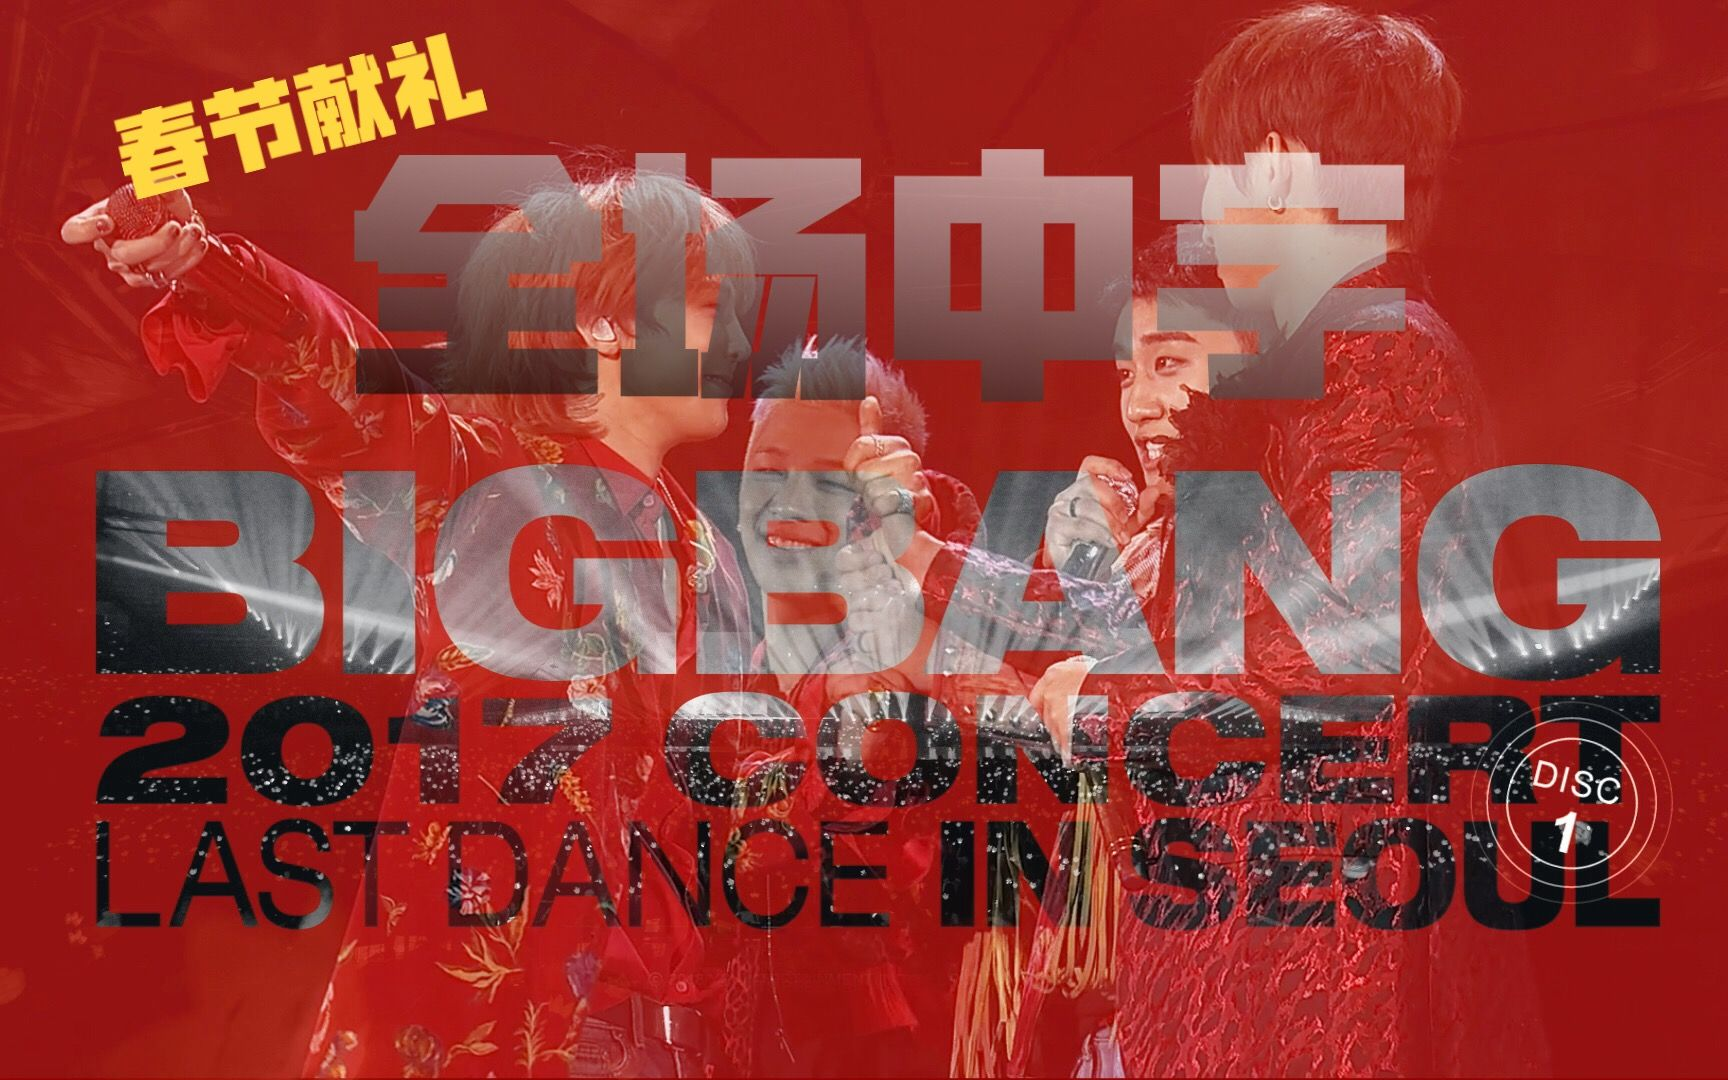 BIGBANG 2017 CONCERT-LAST DANCE-IN SEOUL全场_压制版